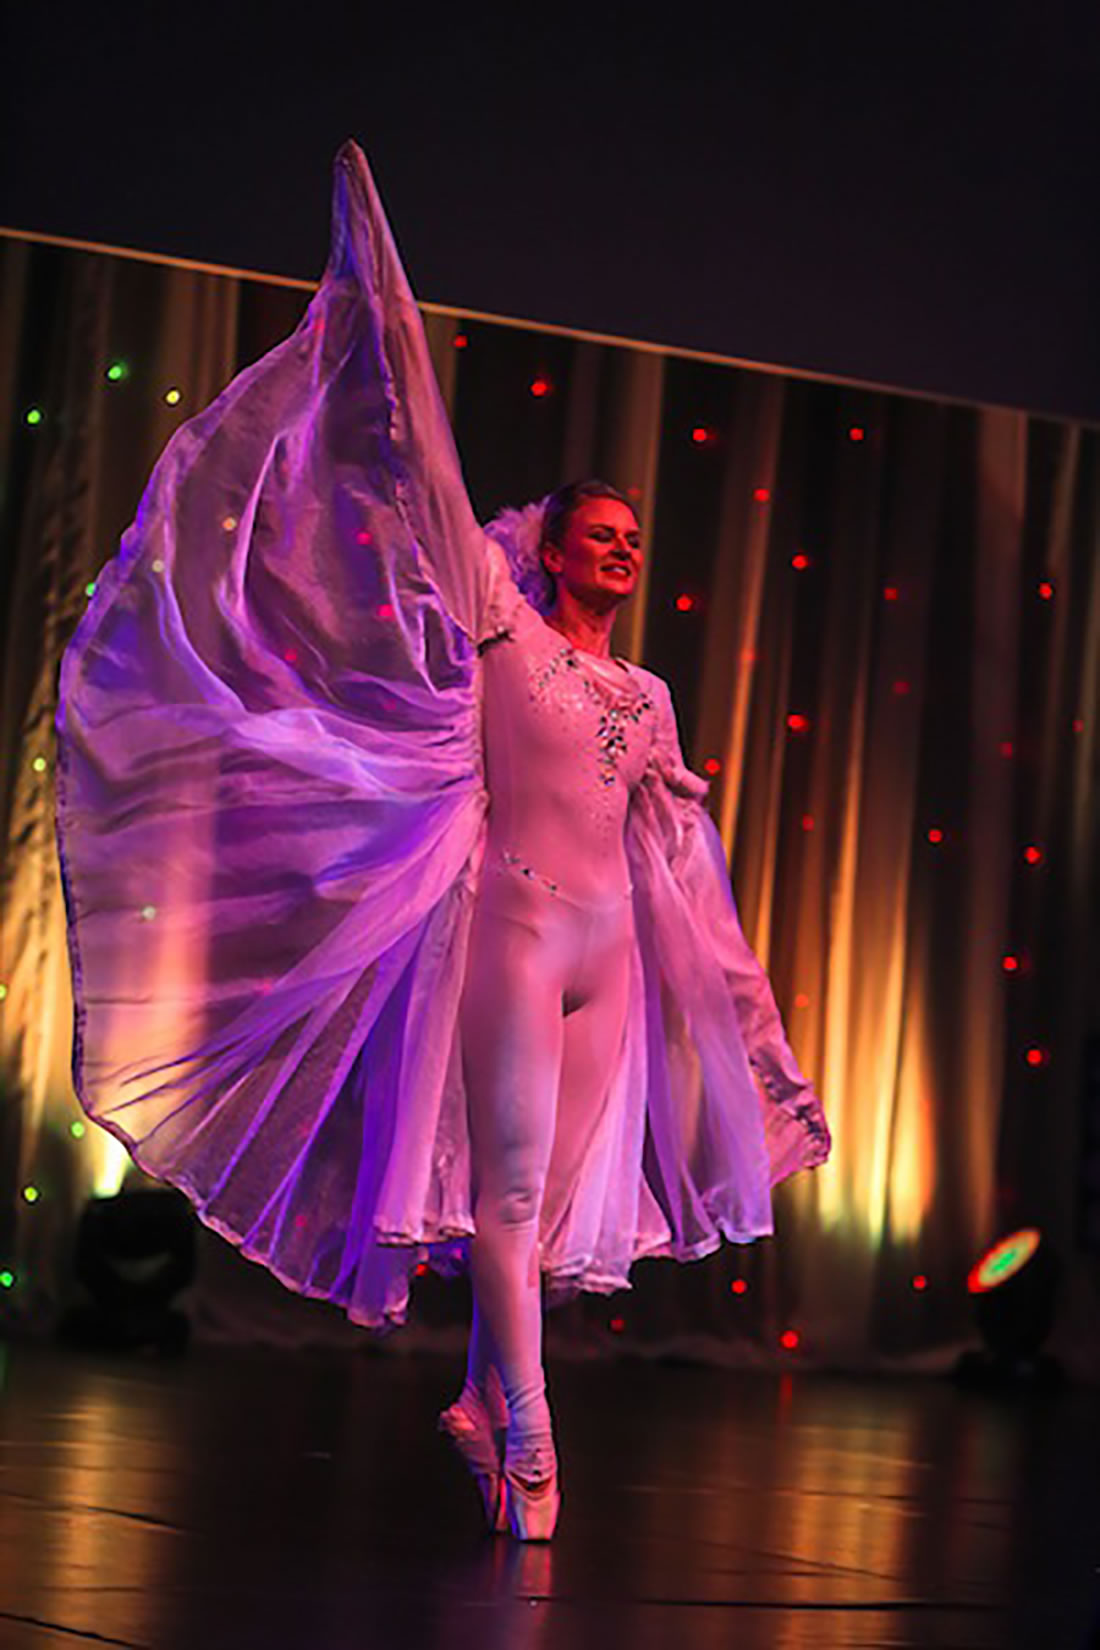 Groundbased Shows - Ballerinas Gallery - Costa Manchester 2